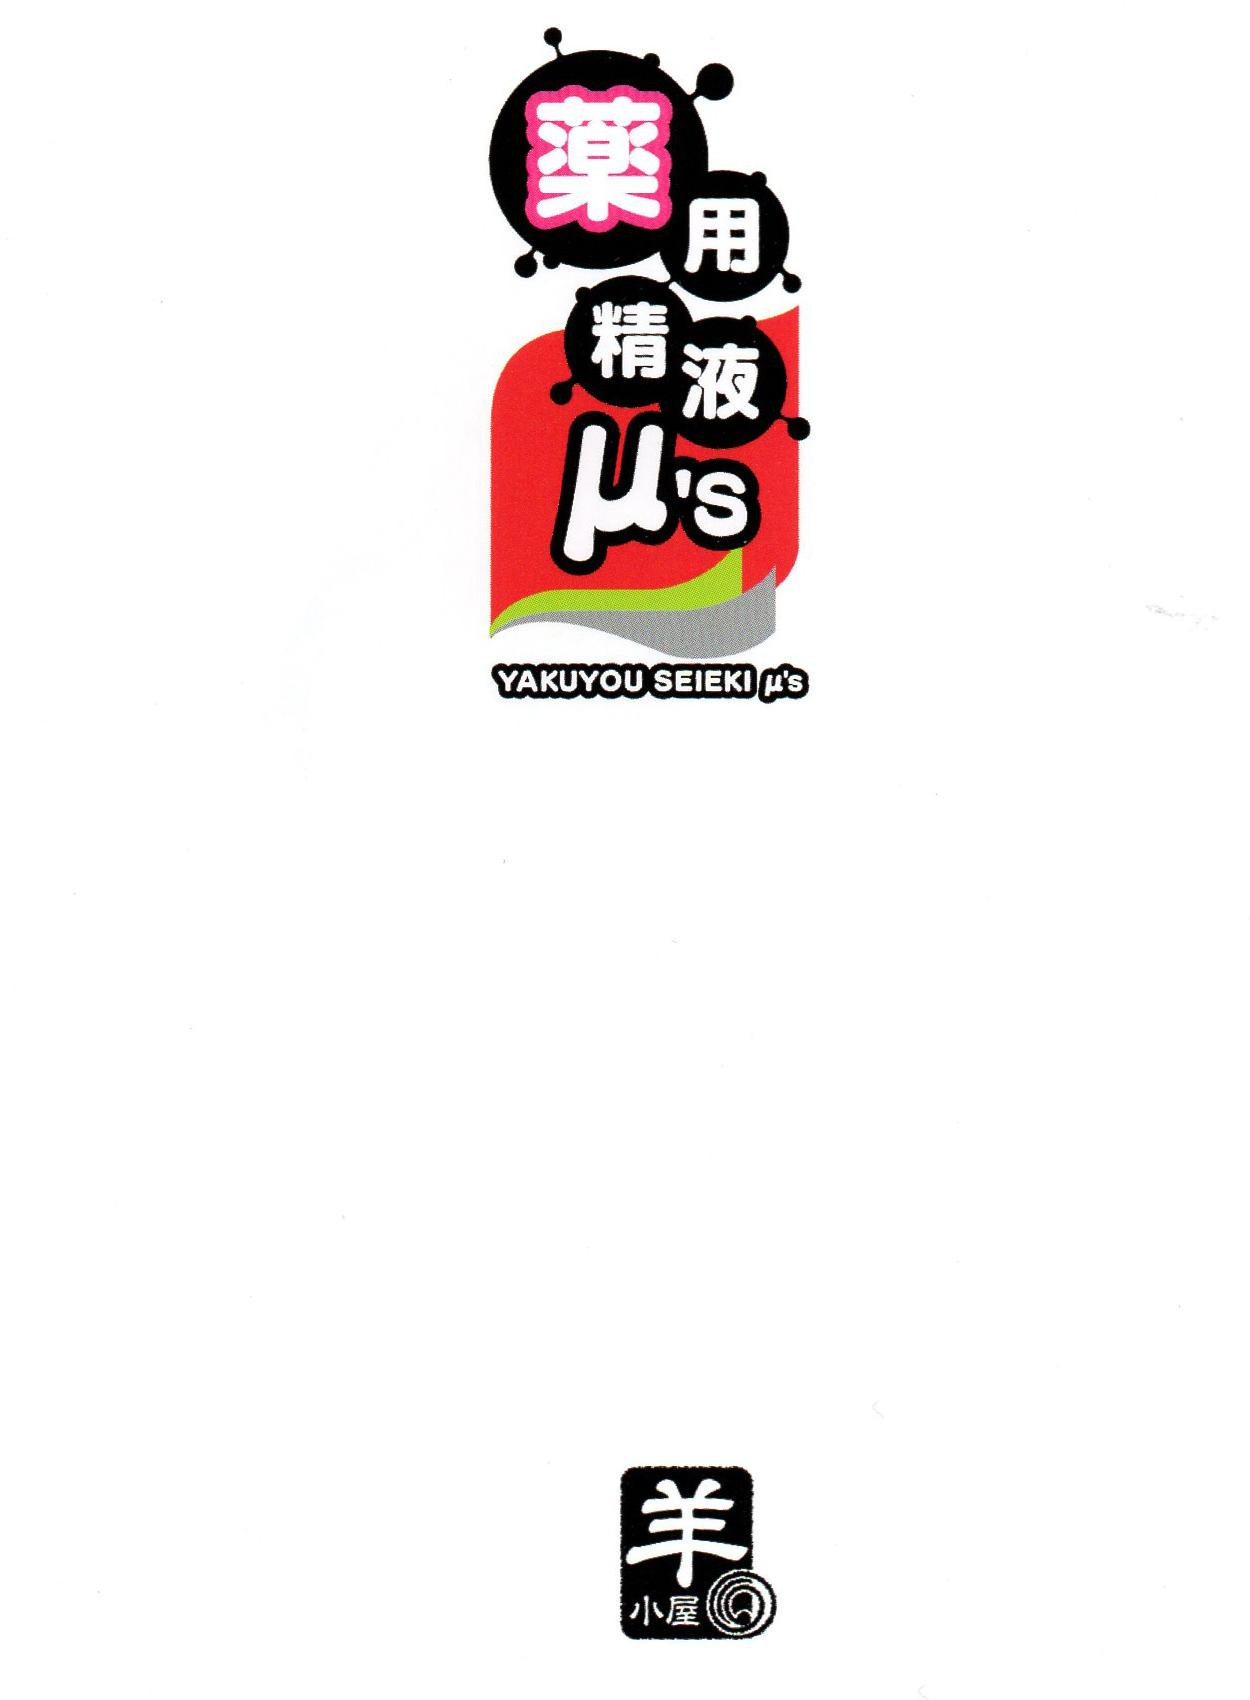 Yakuyou Seieki μ's 21